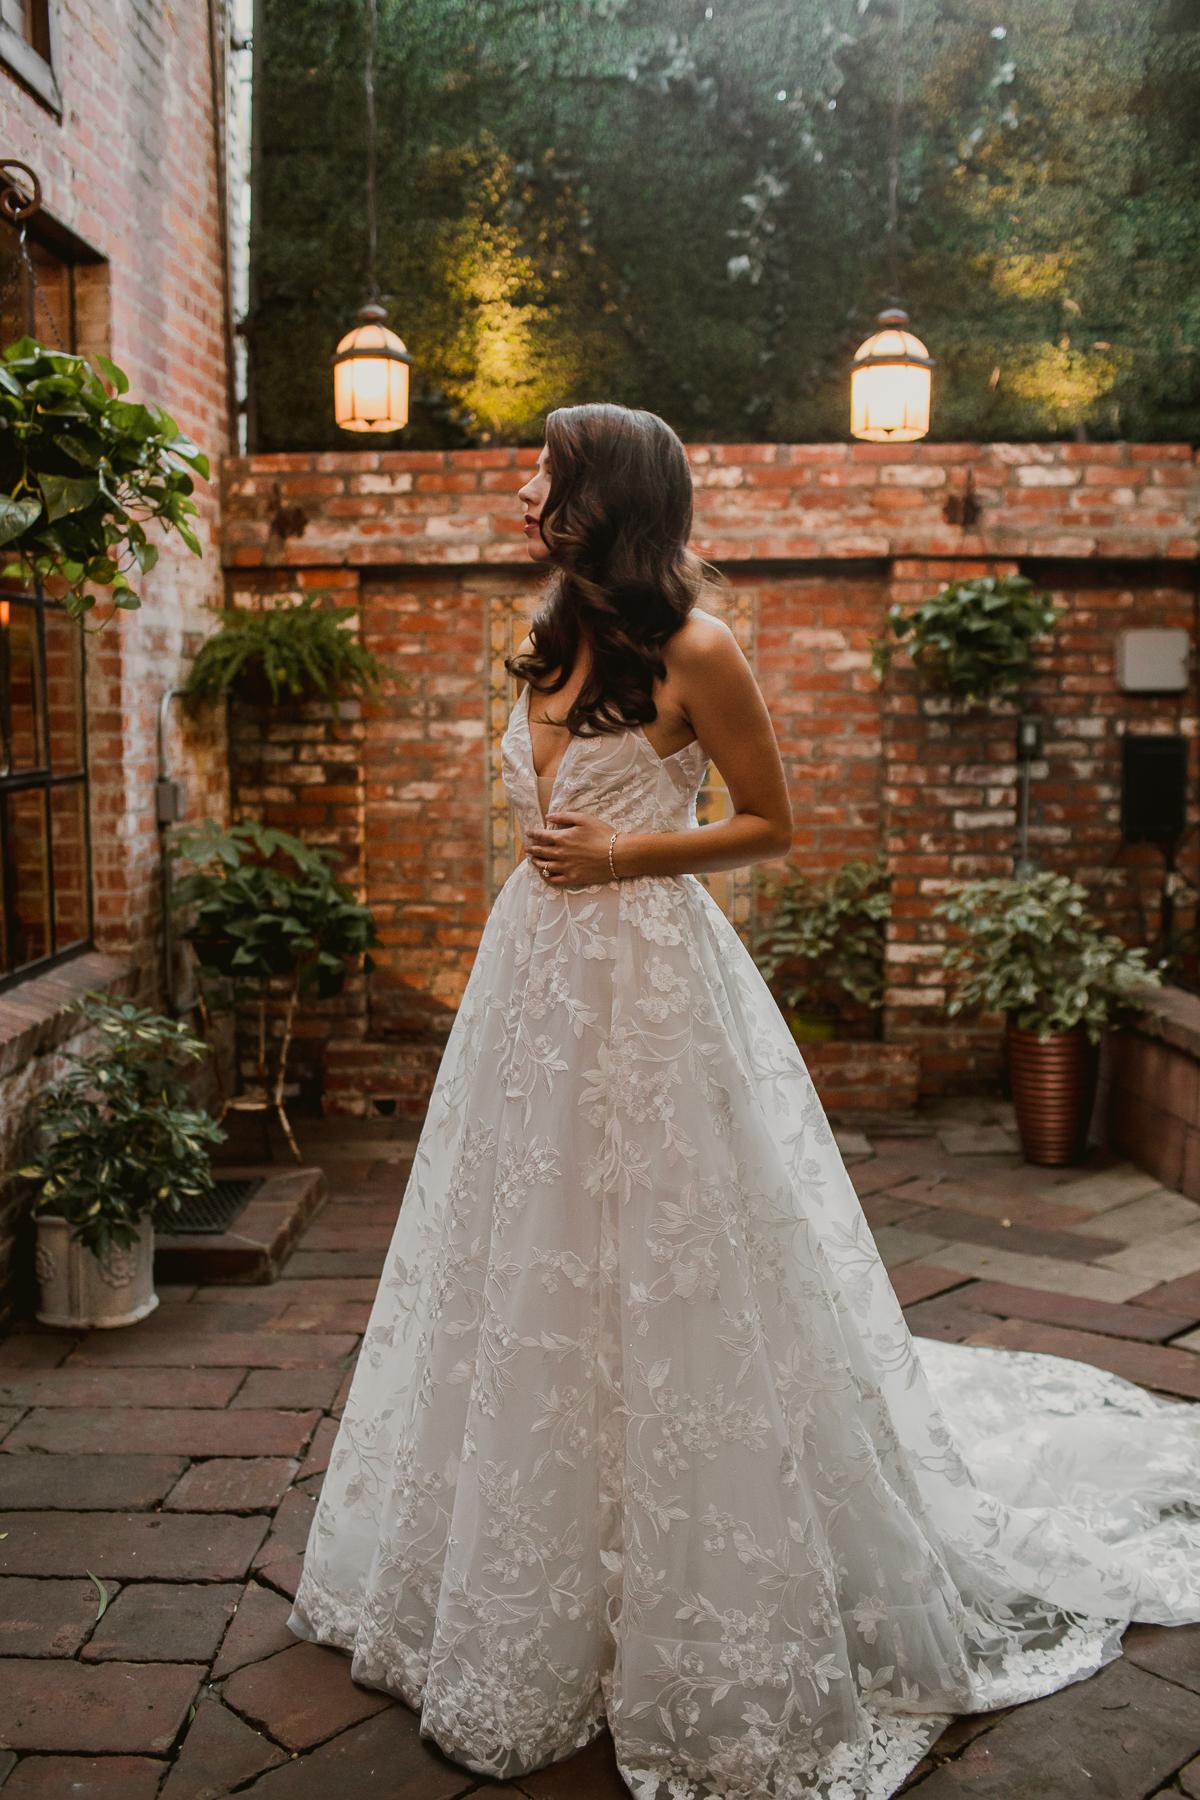 carondelet-house-kelley-raye-los-angeles-wedding-photographer-42.jpg